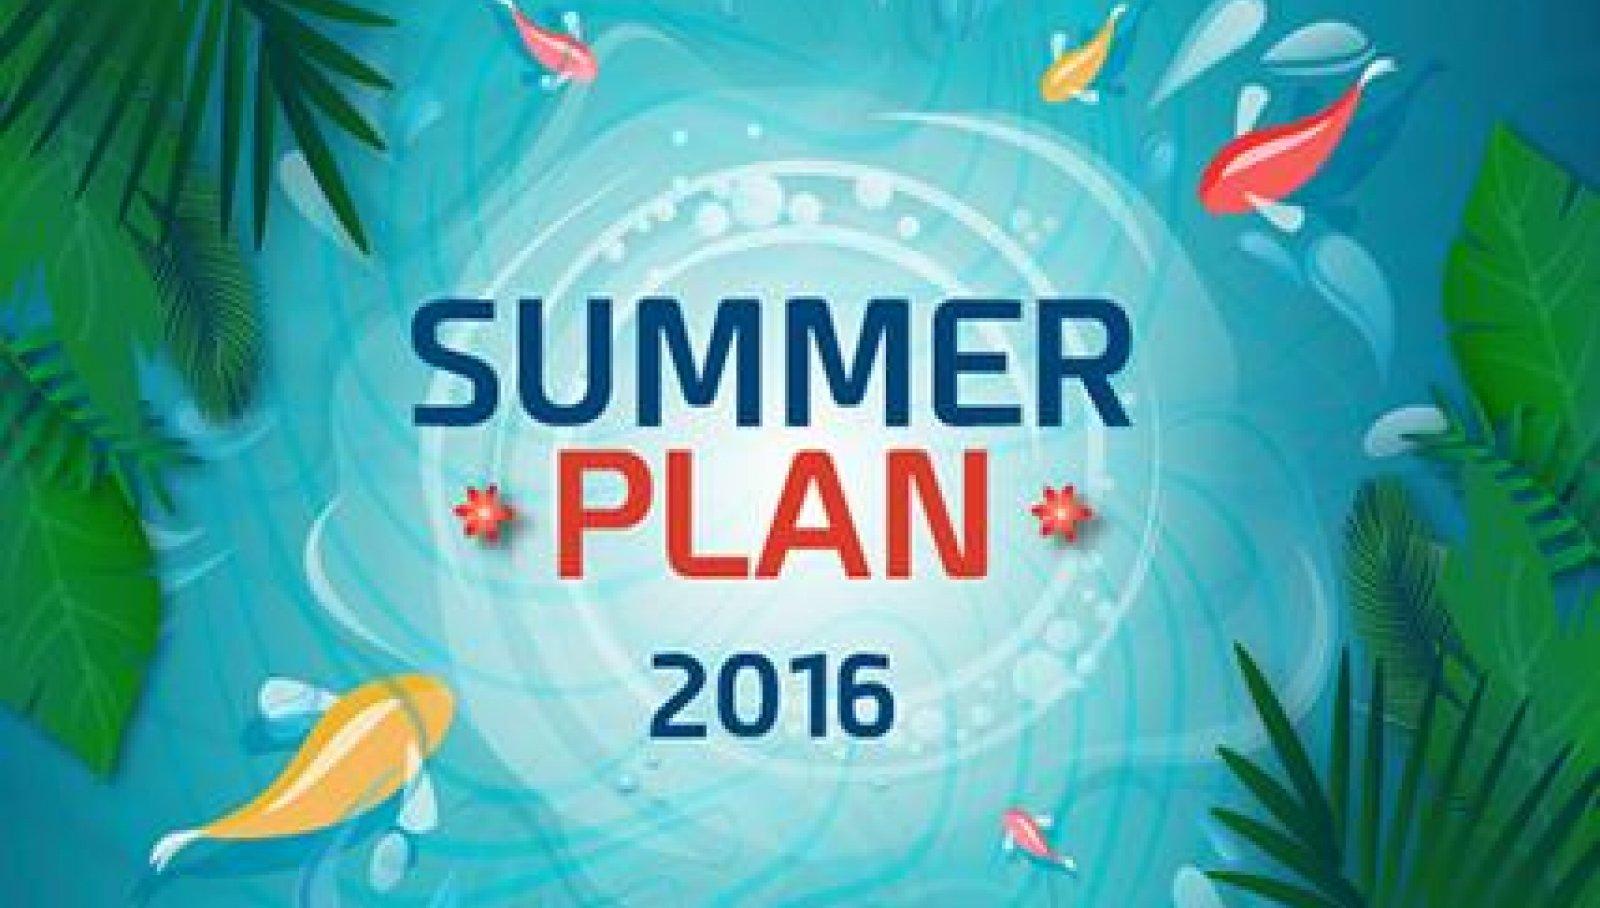 Summer Plan IGPDecaux 2016